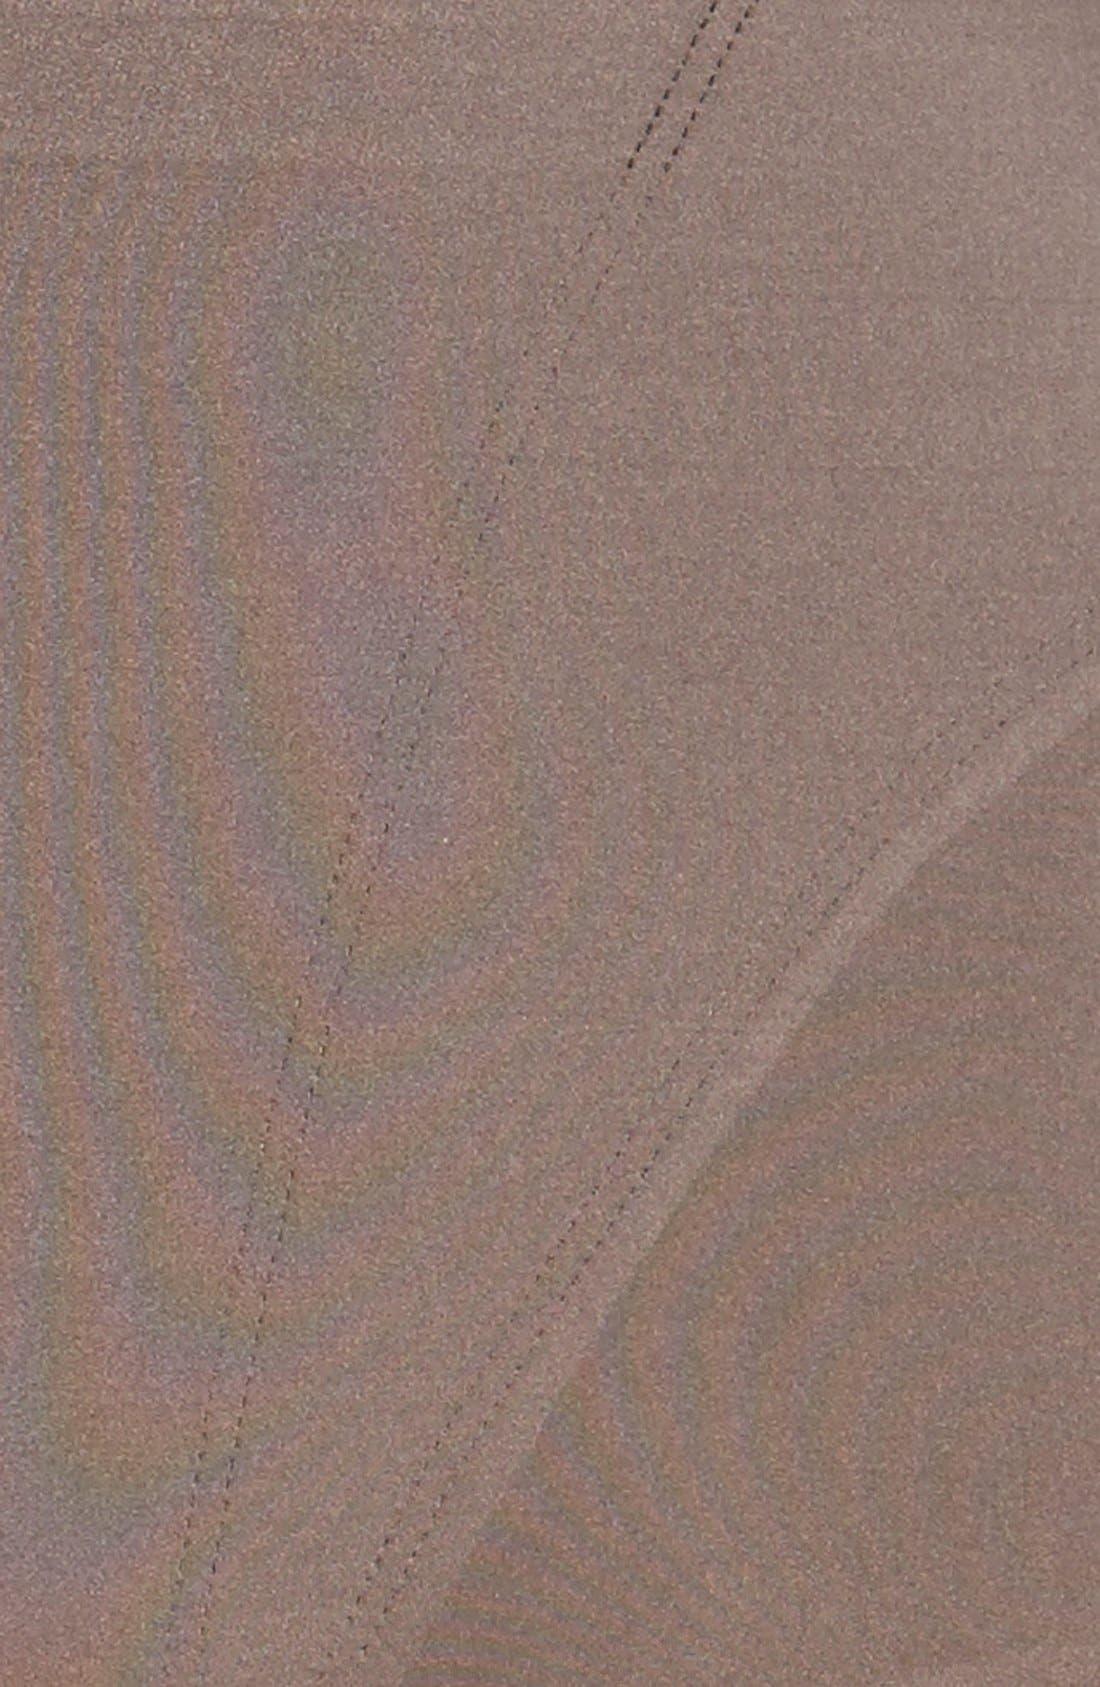 Retro Shaping Panties,                             Alternate thumbnail 6, color,